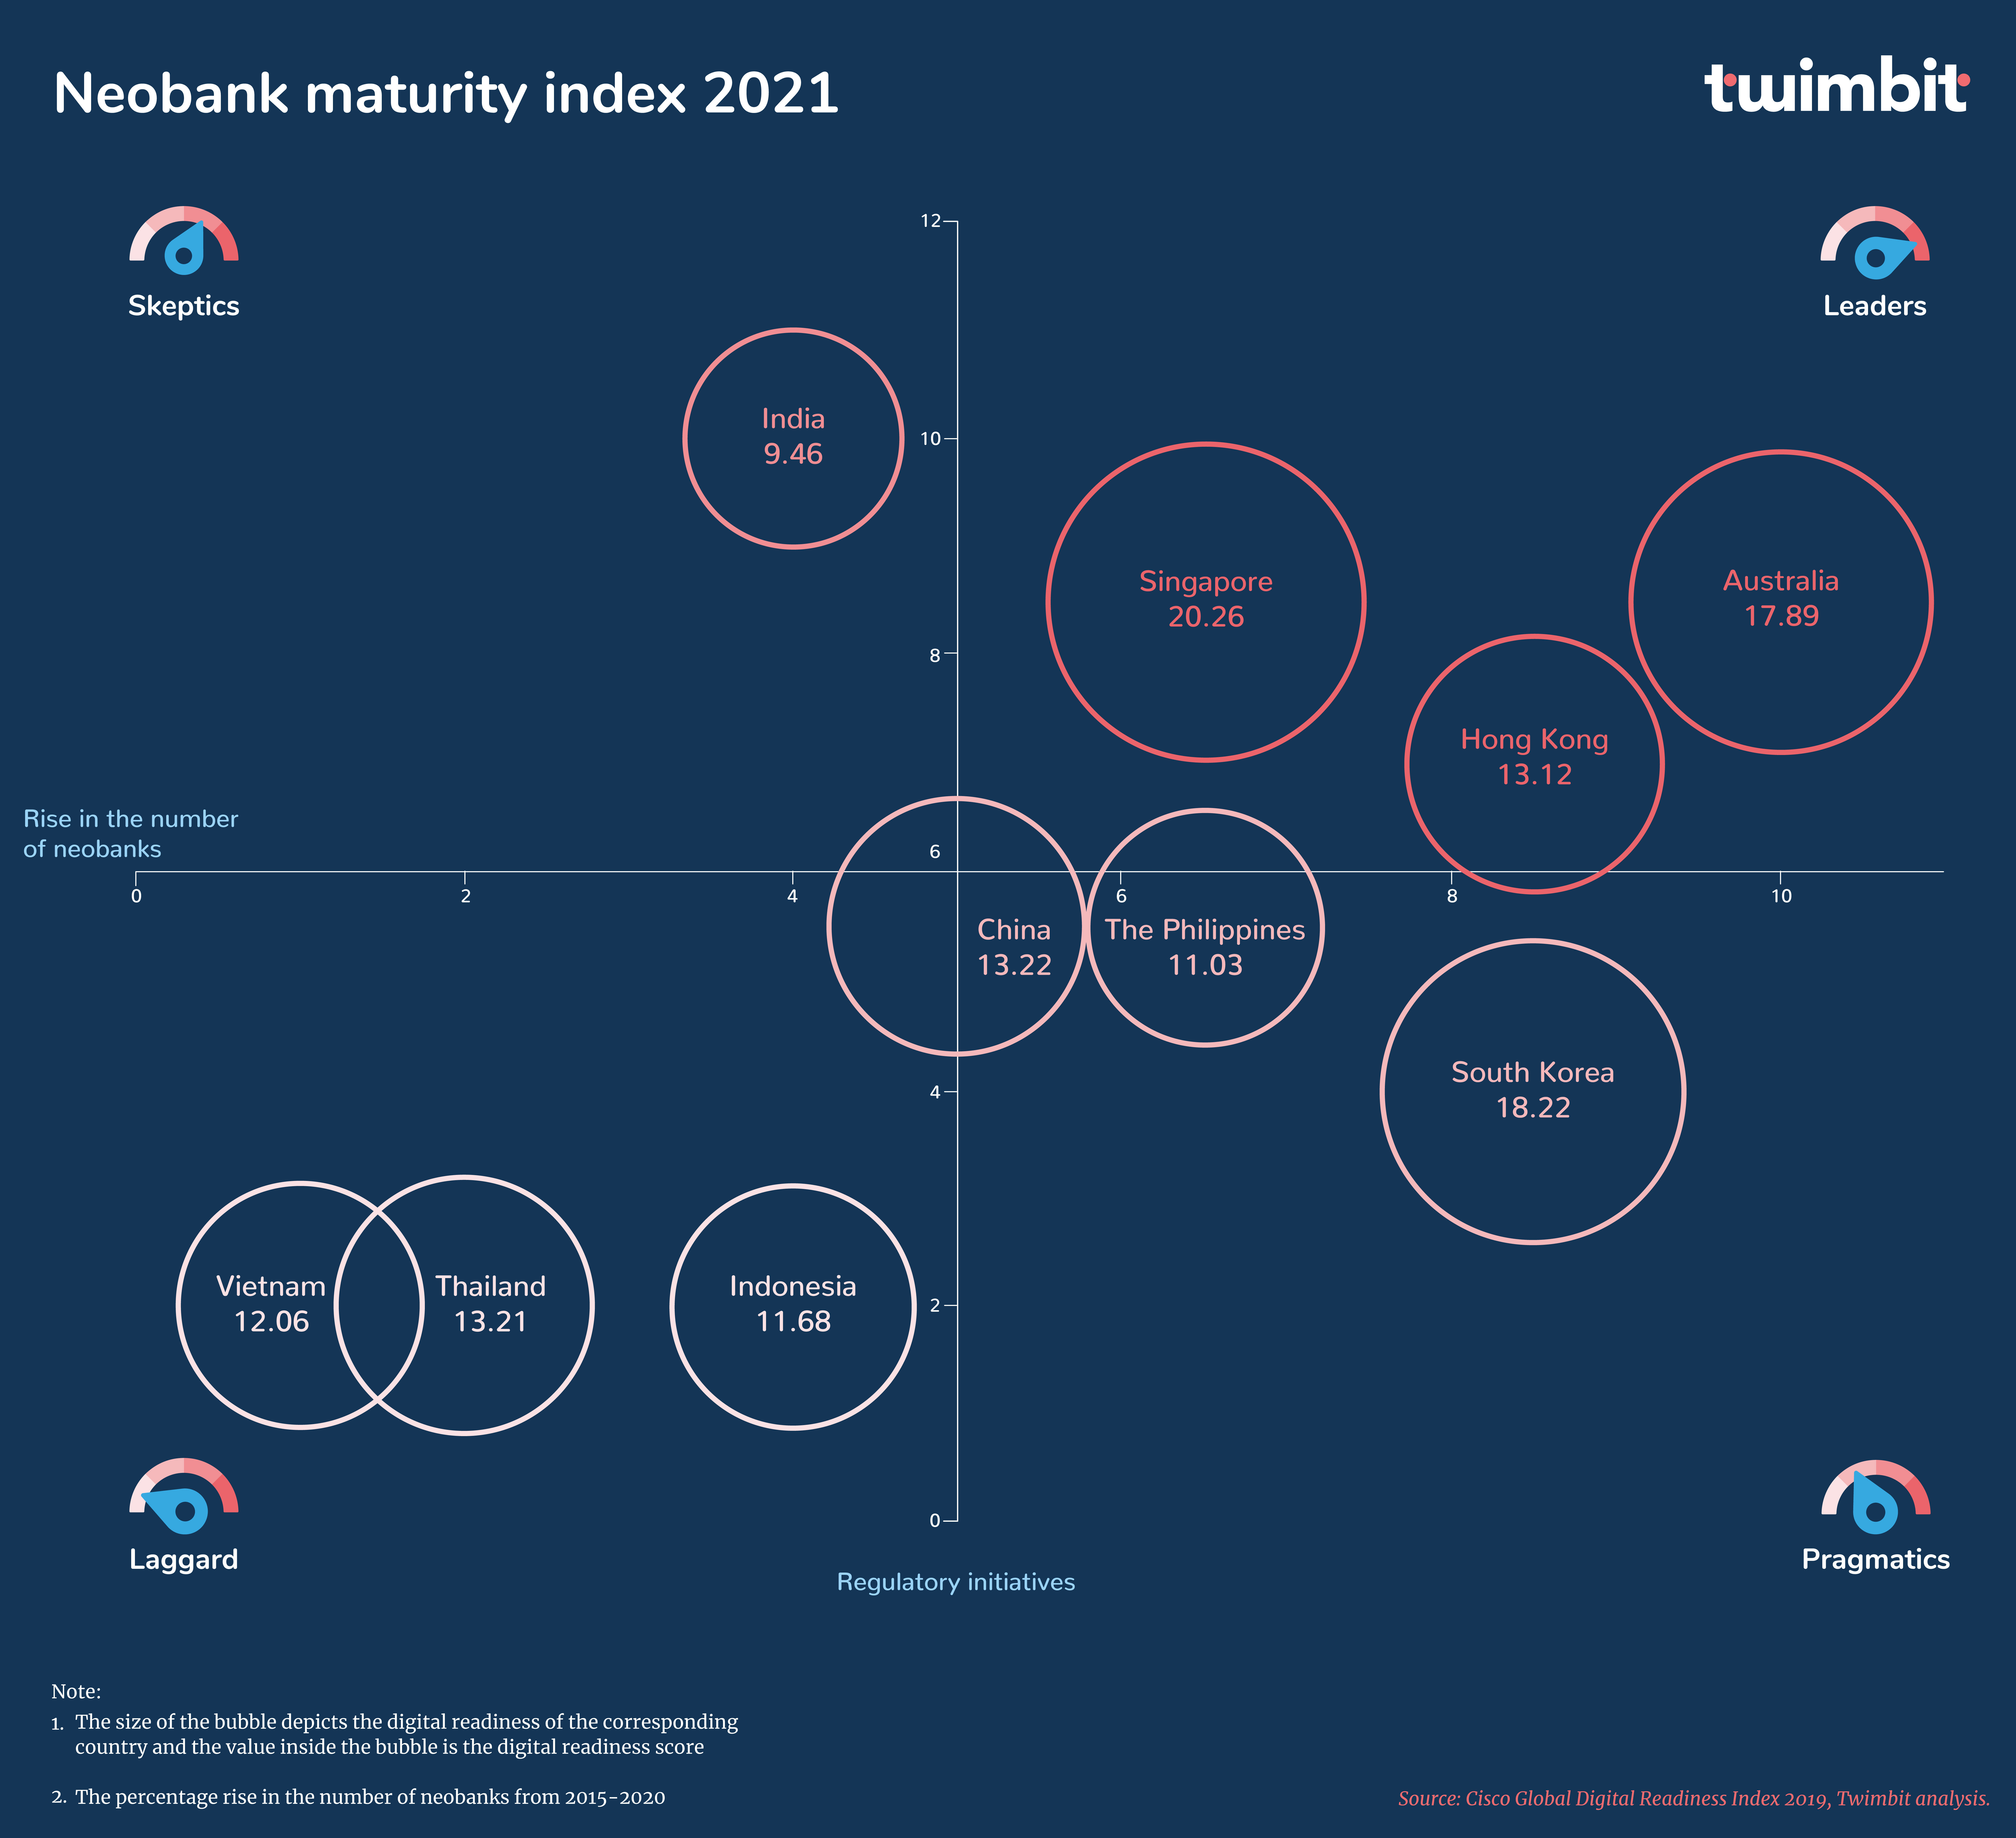 Neo banking maturity index 2021